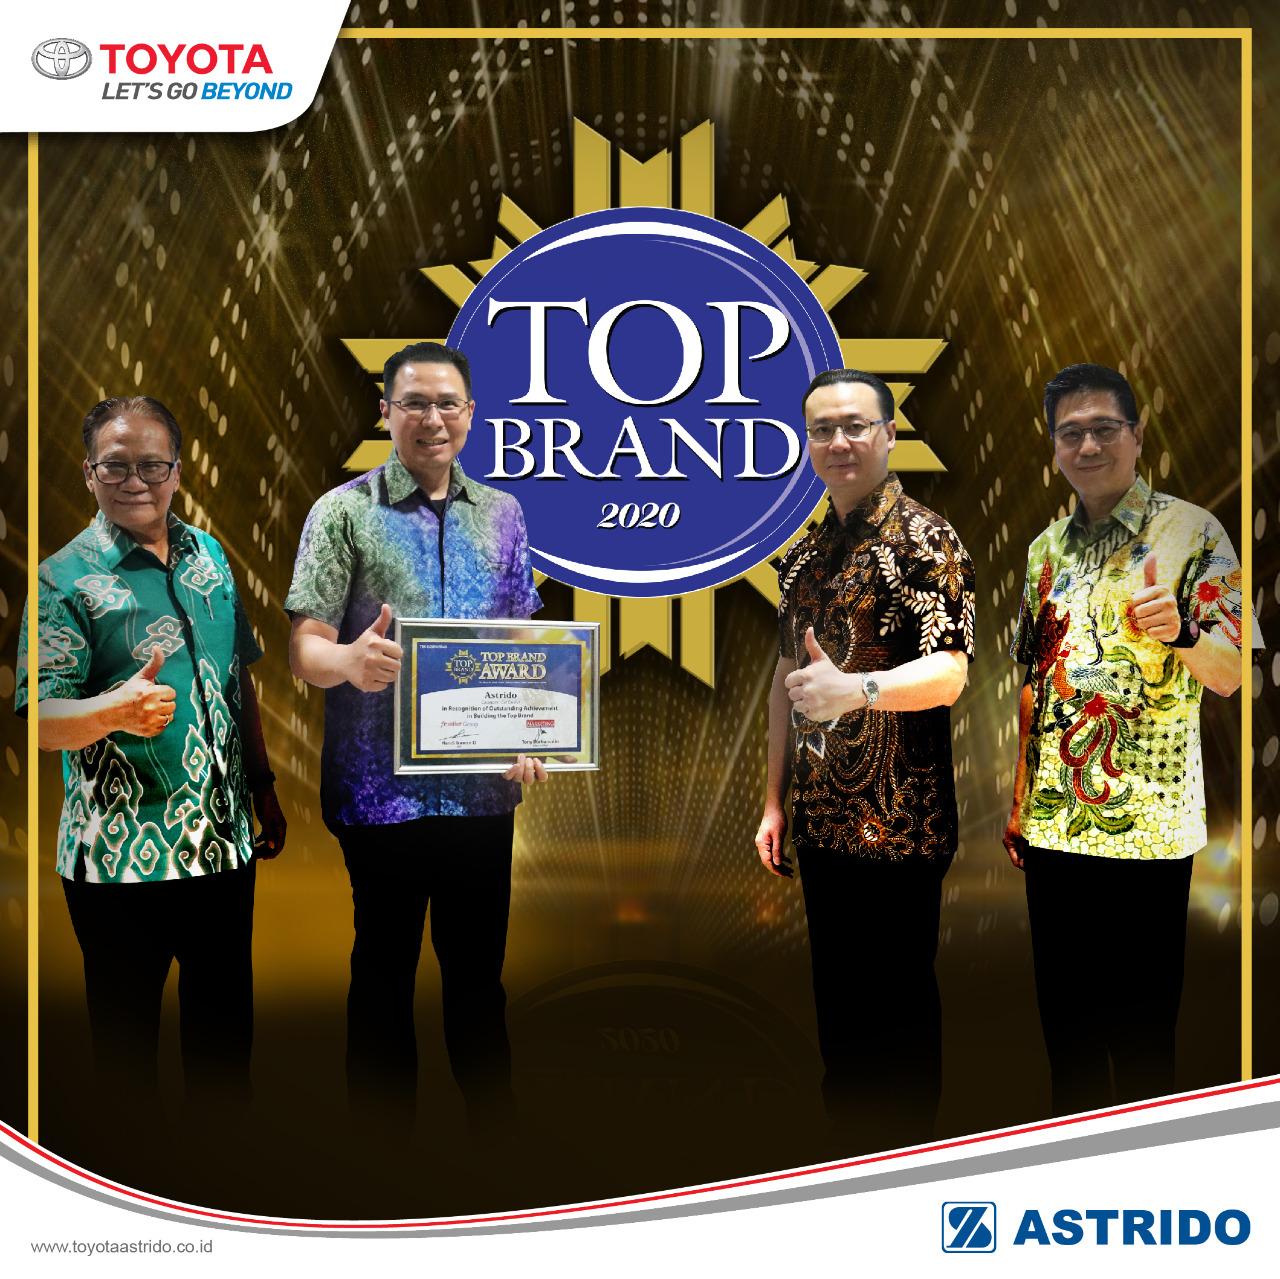 Toyota Astrido Berita & Artikel